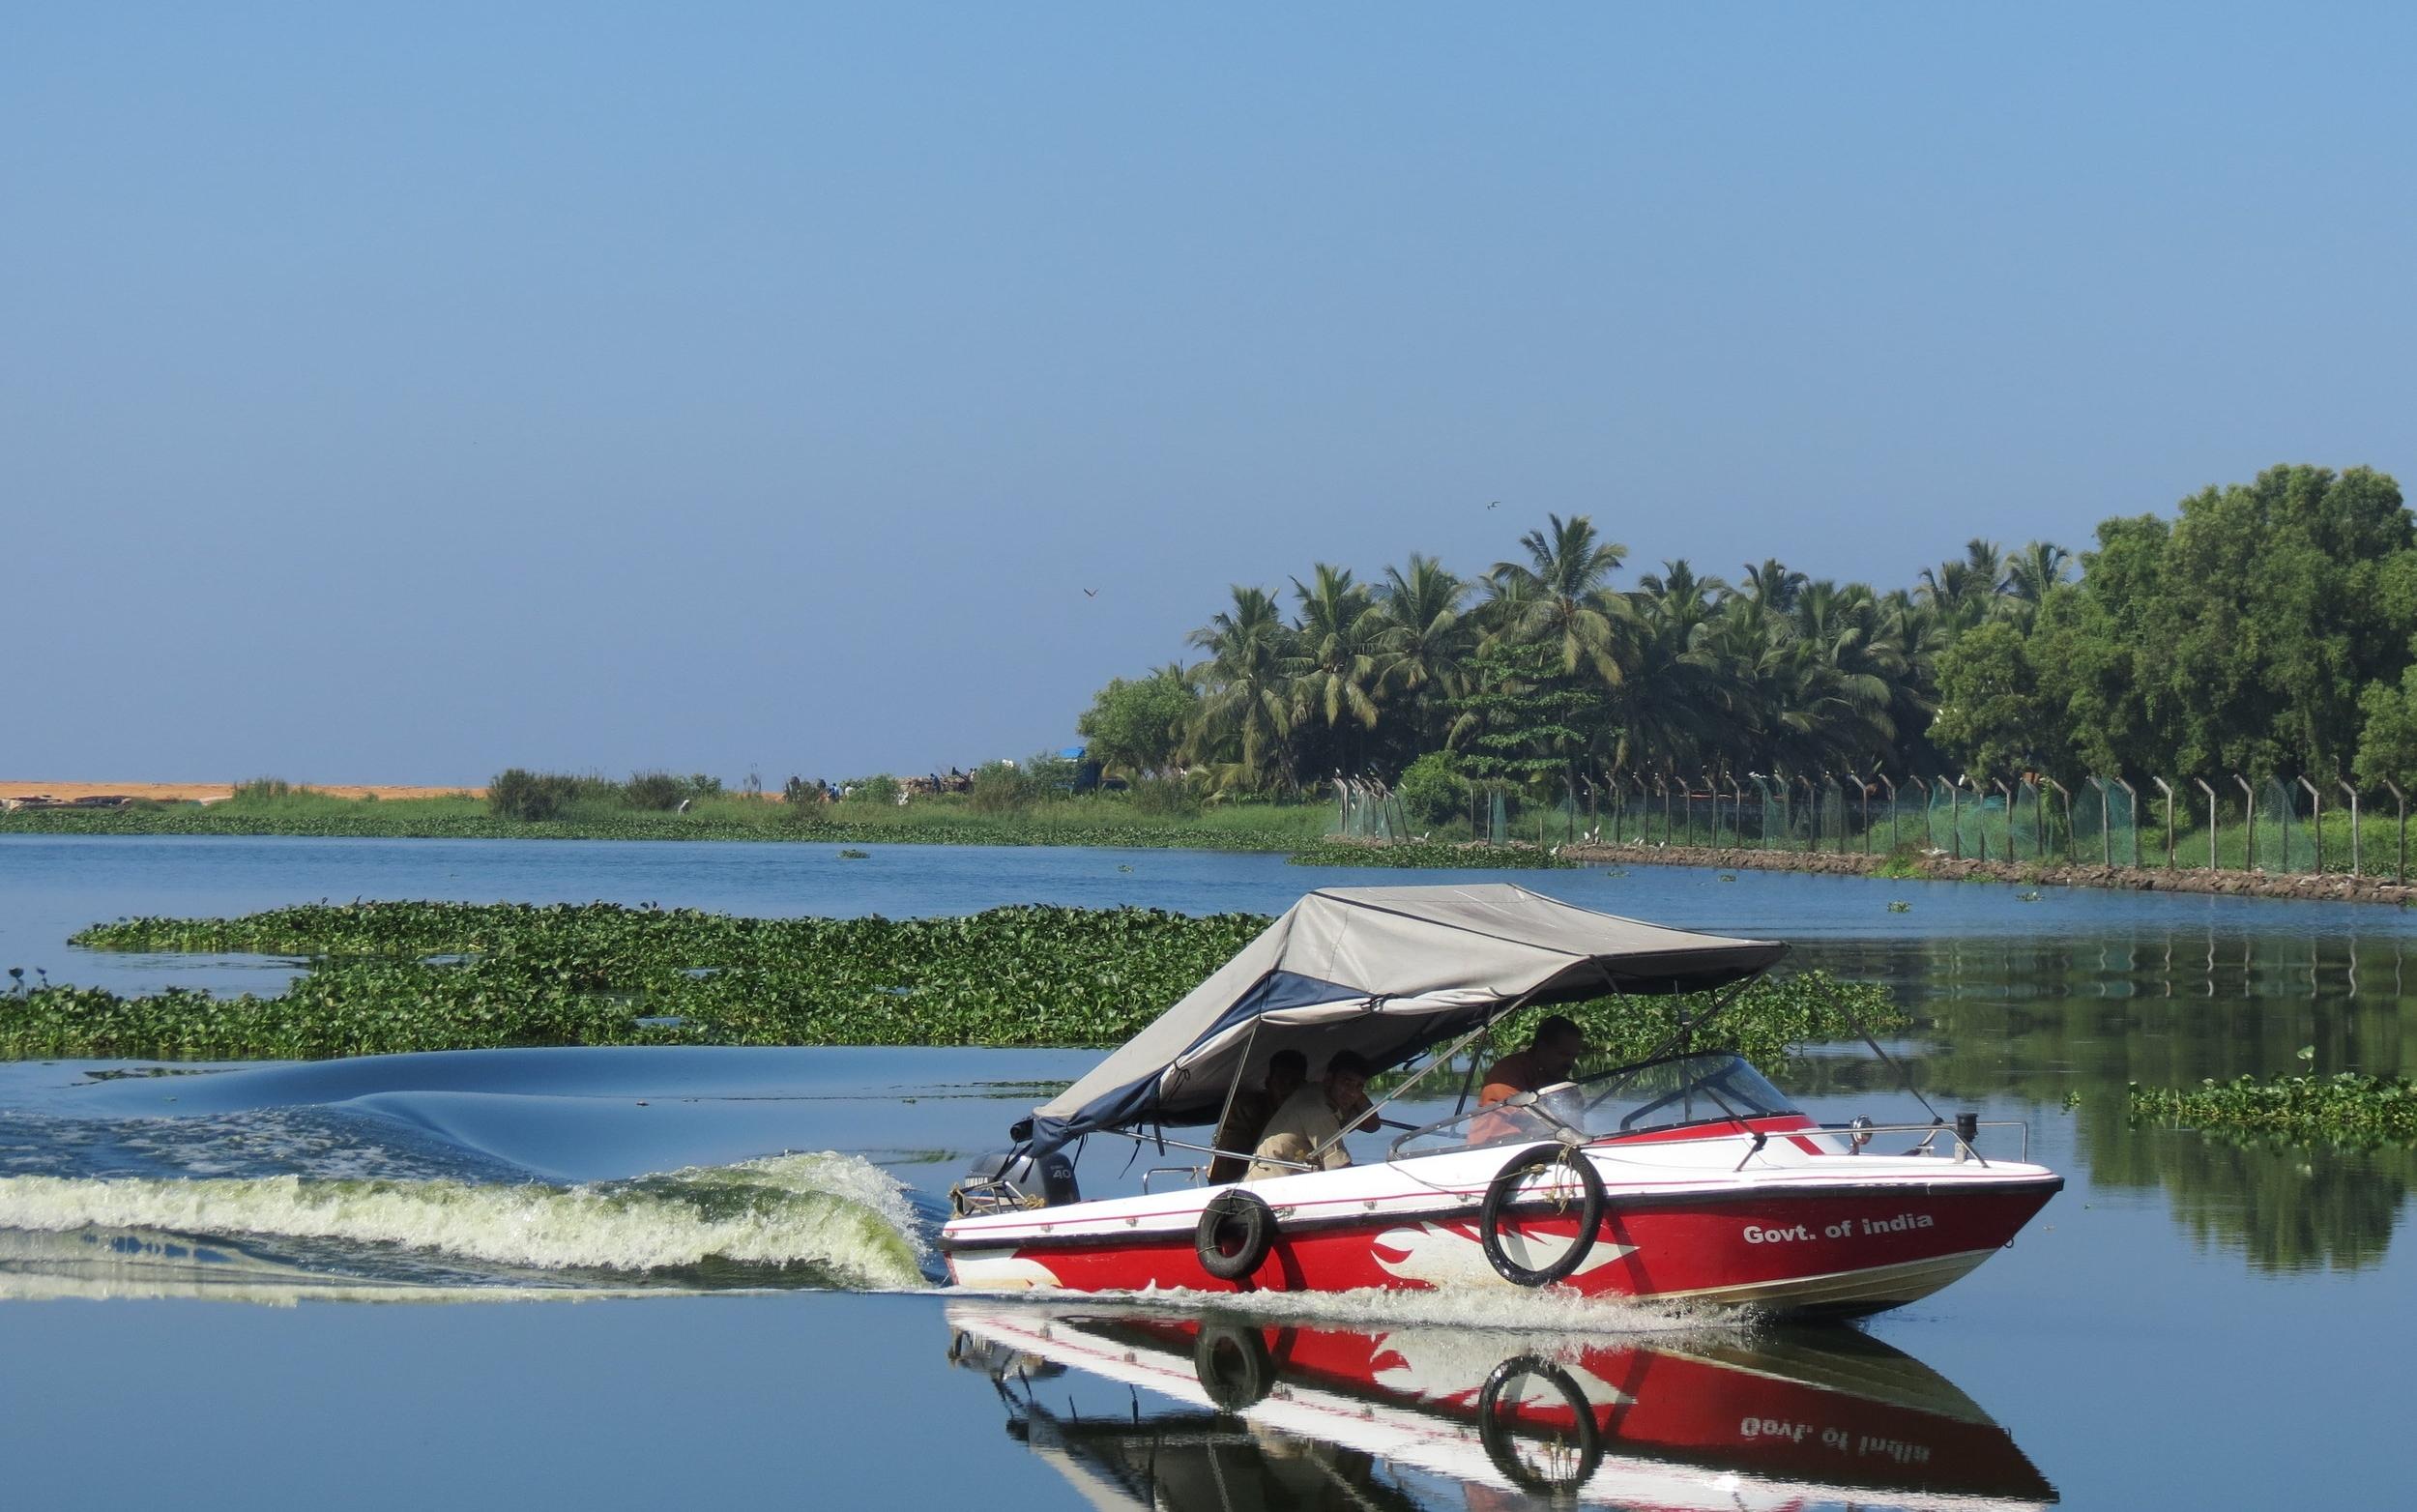 india-trip-2012-320.jpg